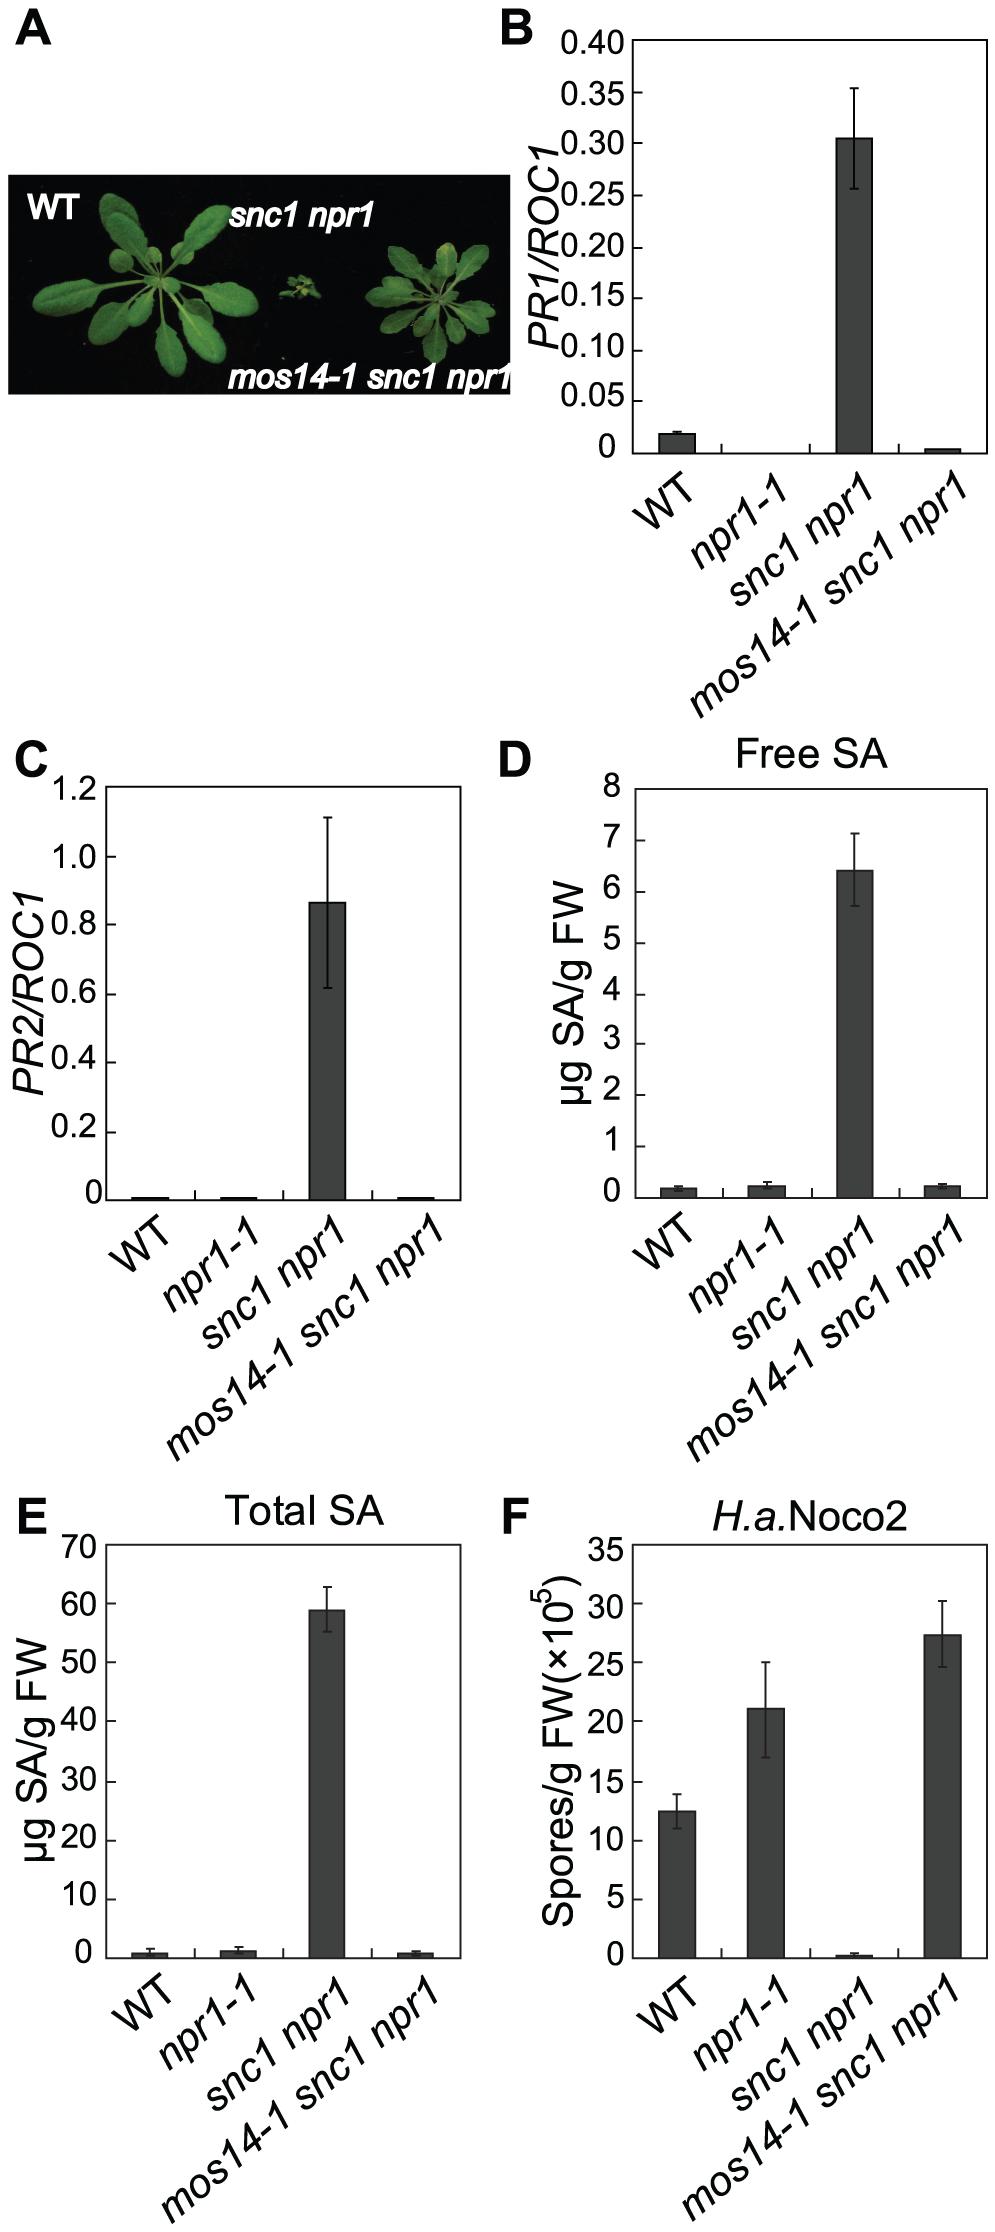 Constitutive immune responses in <i>snc1</i> are suppressed by <i>mos14-1</i>.